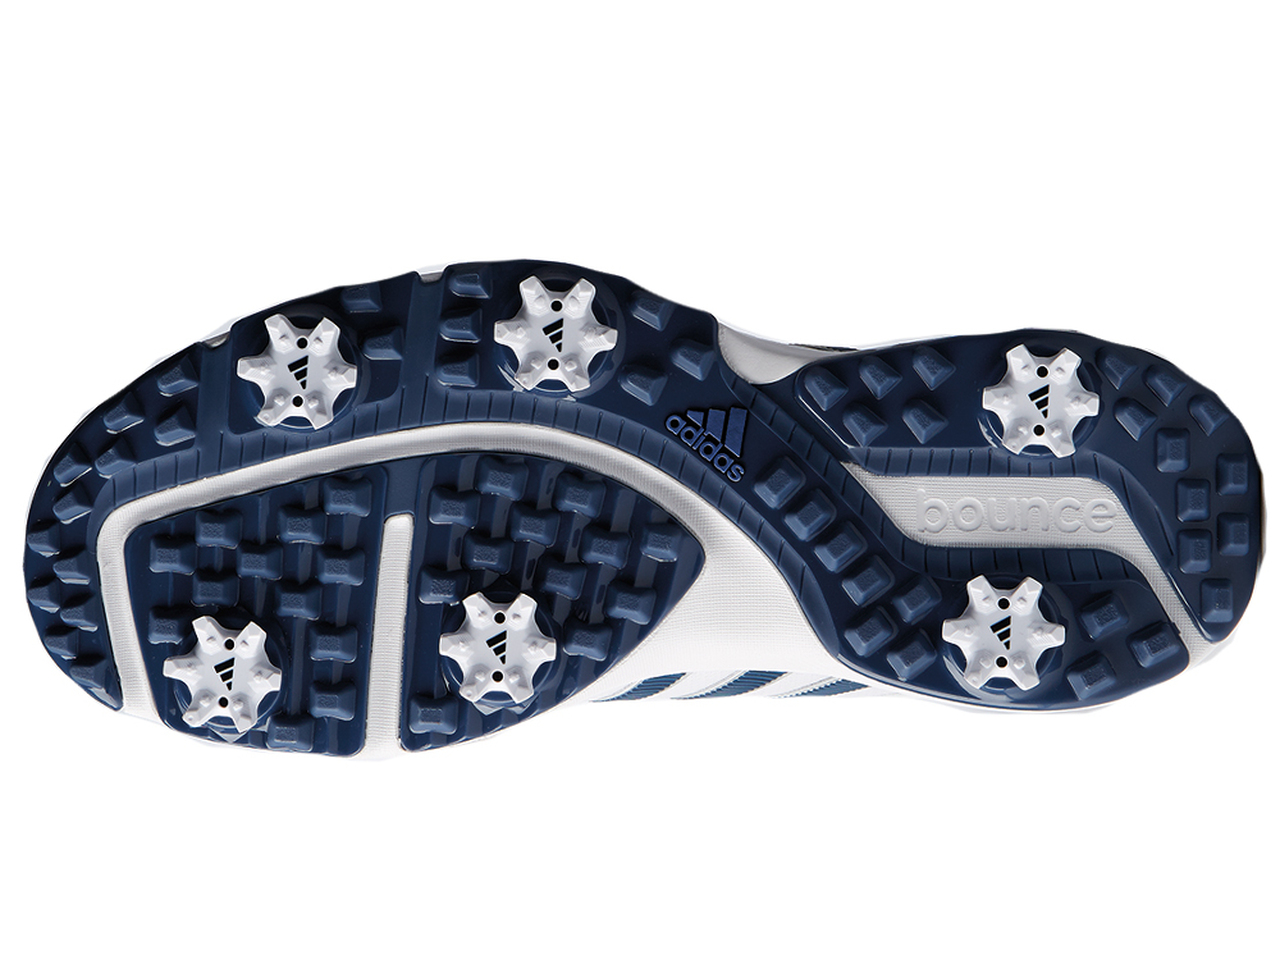 5bb96ea27 Adidas 360 Bounce Golf Shoes - FWTR White Noble Indigo - Mens For ...